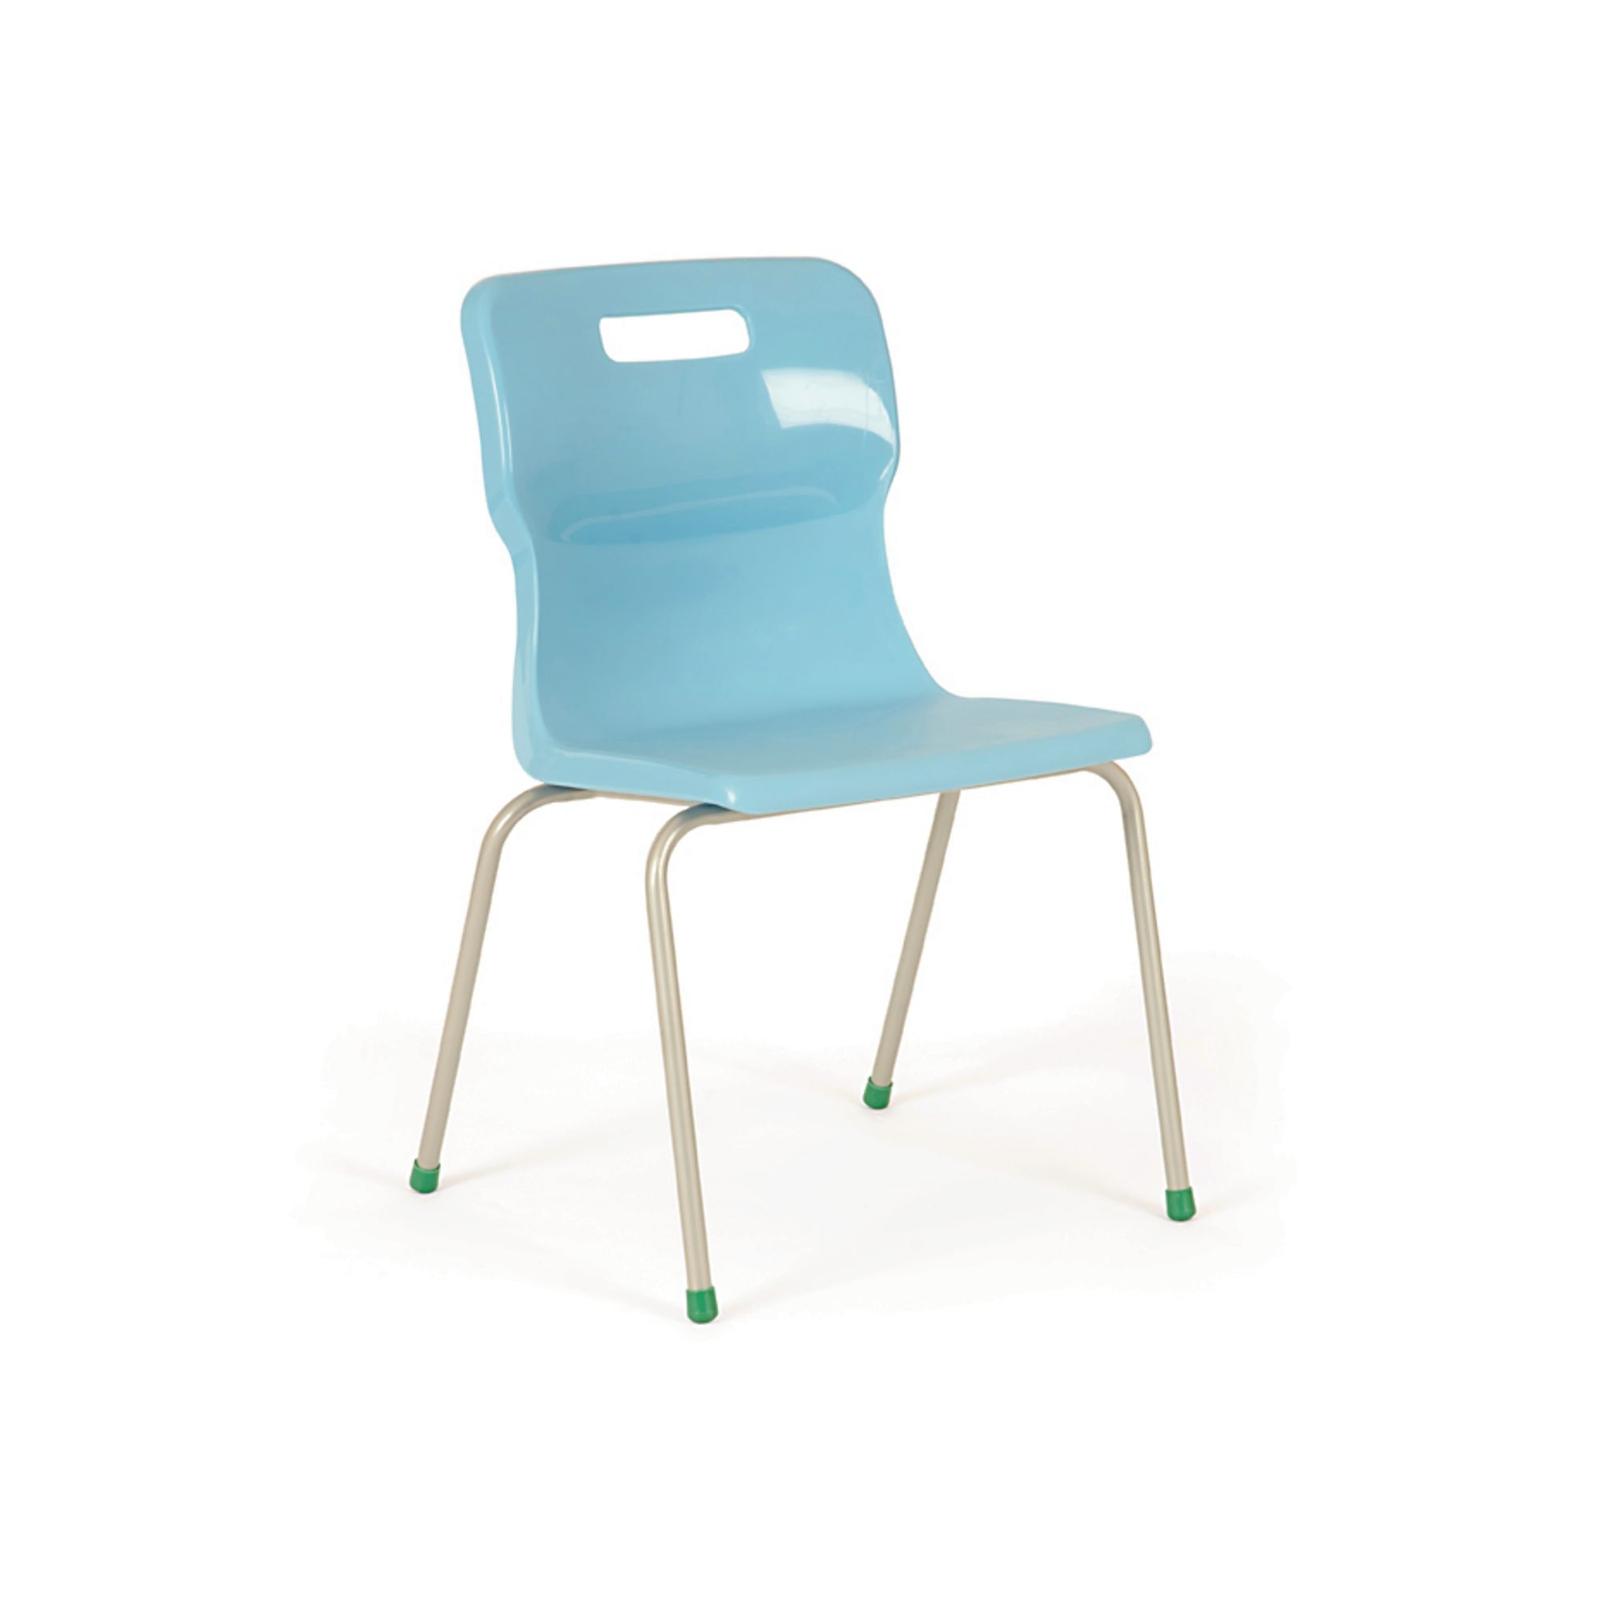 Titan 4 Leg Chairs - Size 6 Age 14+ Sky Blue